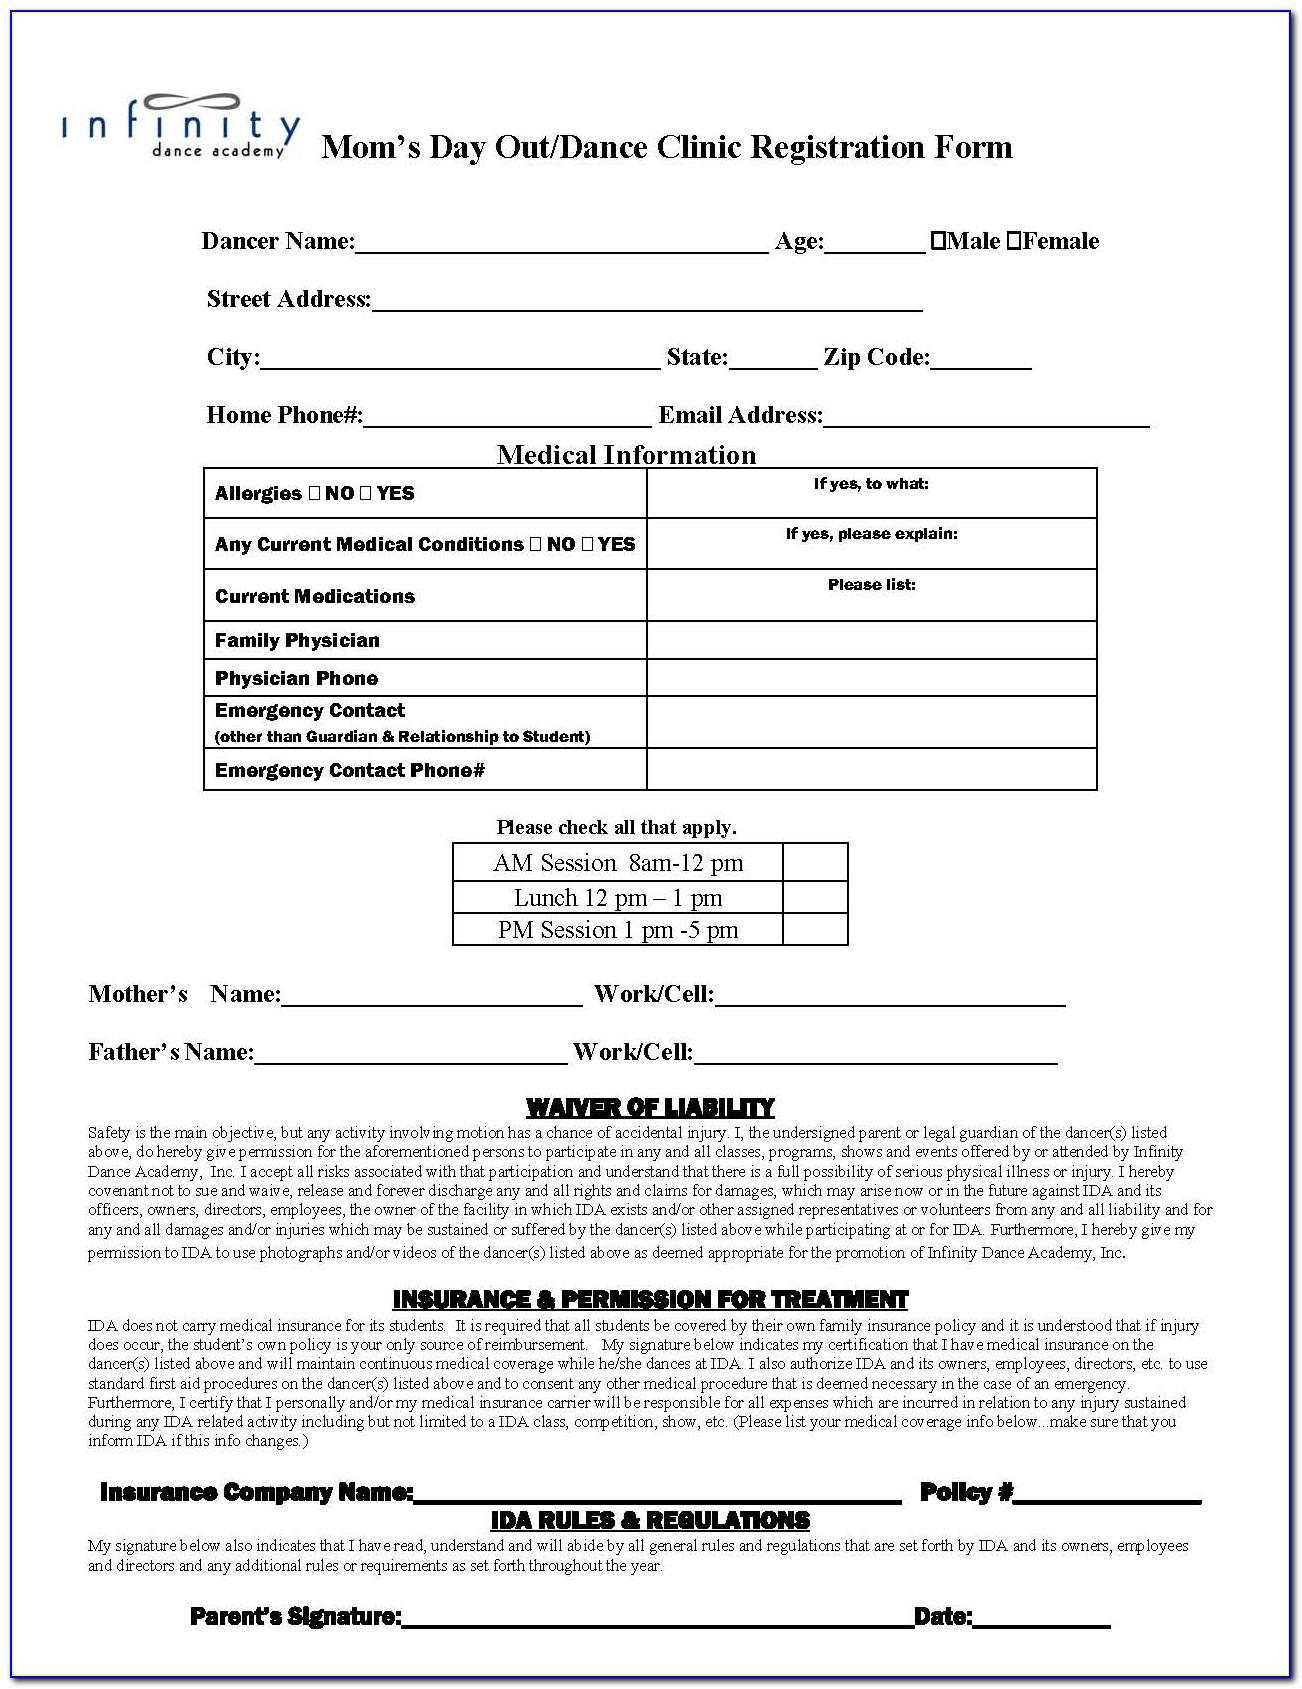 Dance Competition Registration Form Template